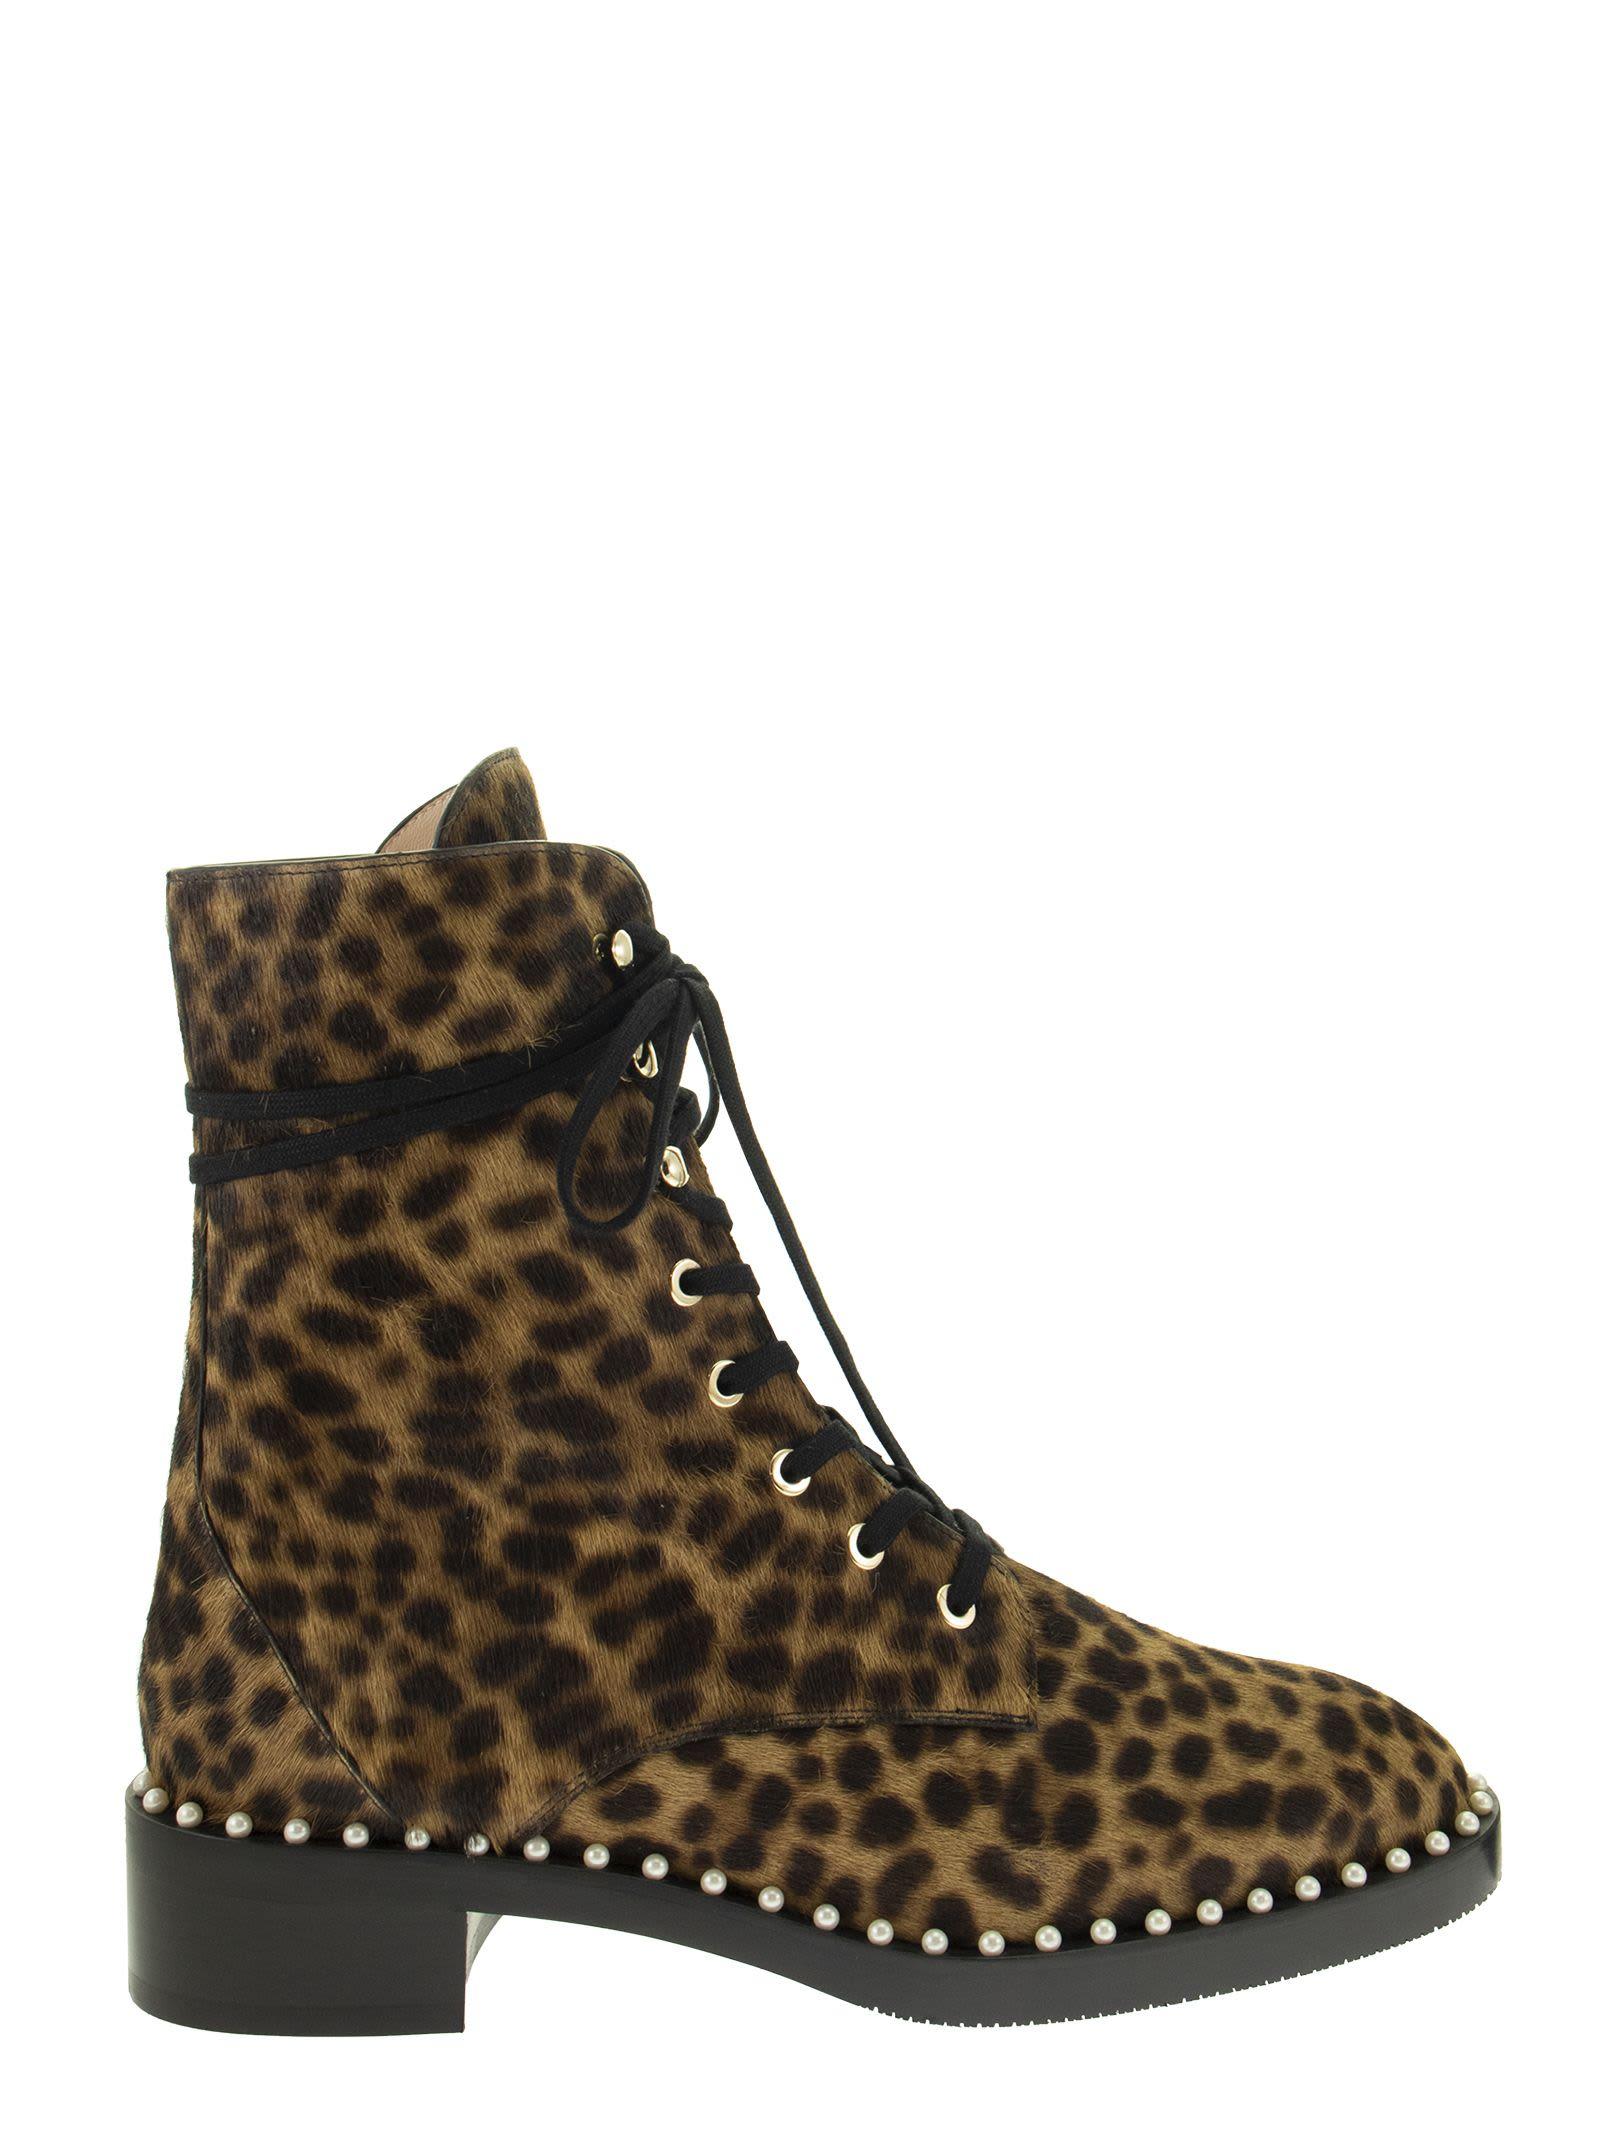 Buy Stuart Weitzman Sondra Classic - Cheetah Leather Ankle Boot online, shop Stuart Weitzman shoes with free shipping